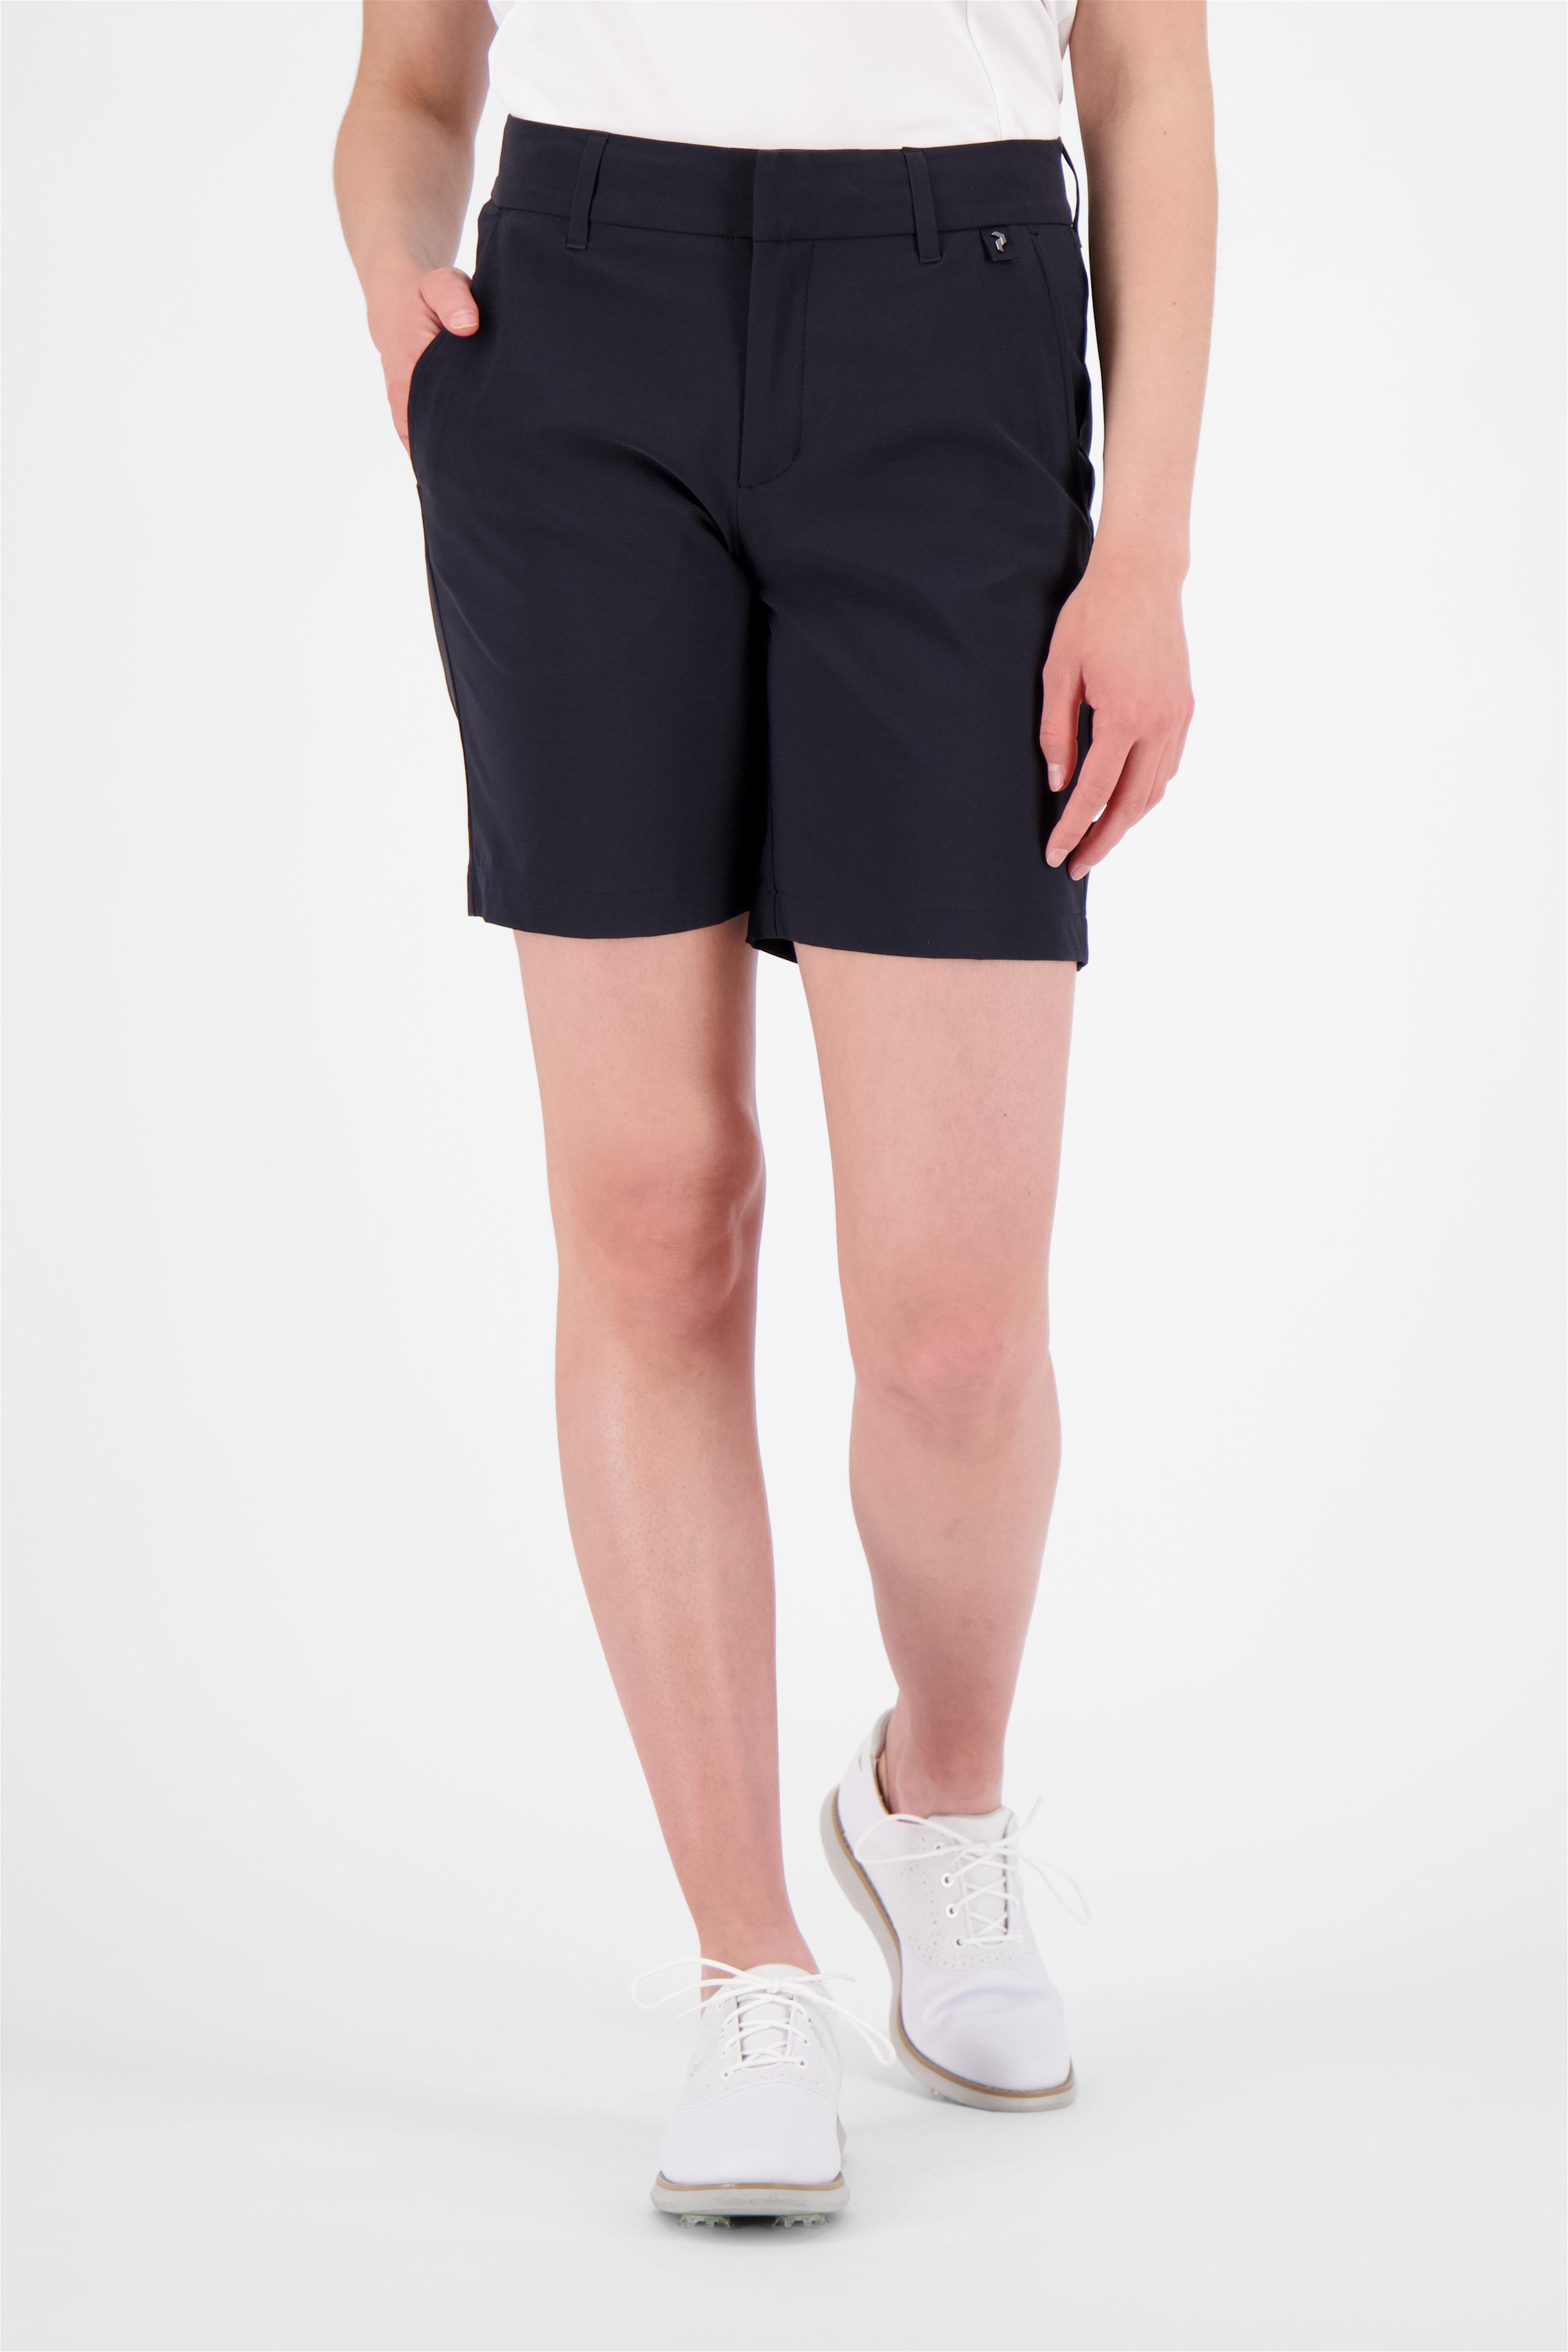 Illusion Shorts